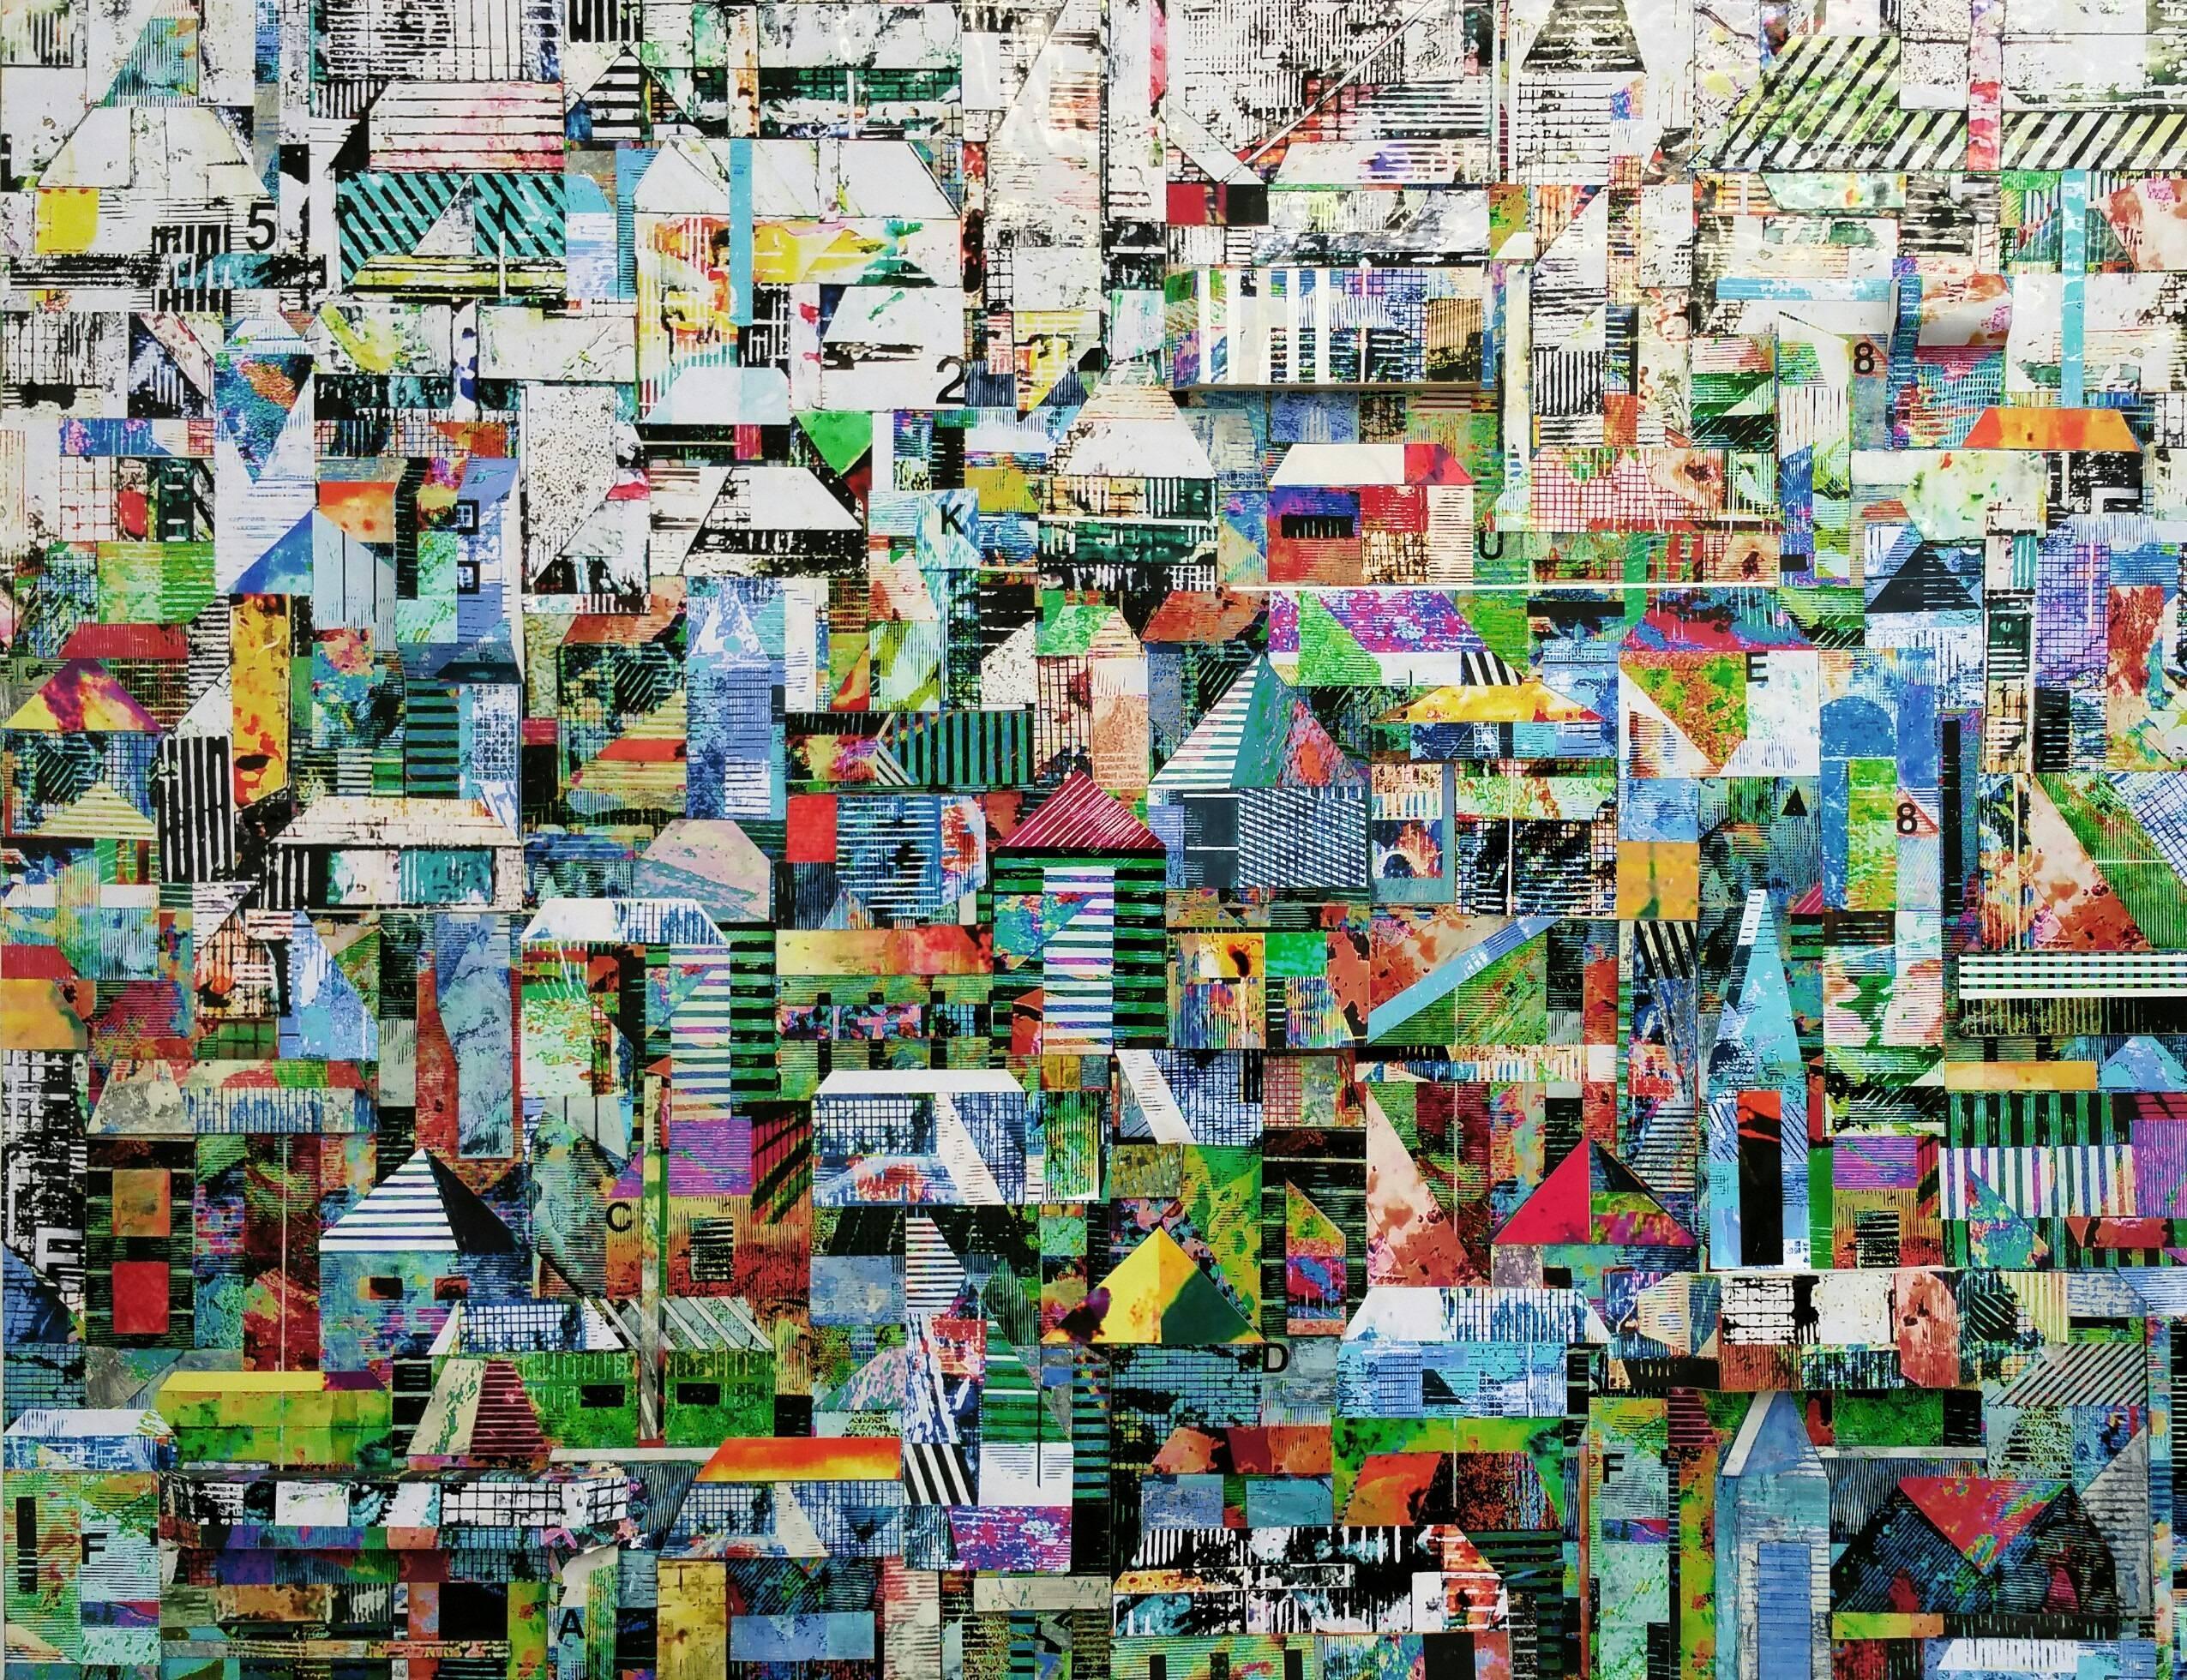 Sublime 709 - Original Photographic Collage Mixed Media Artwork